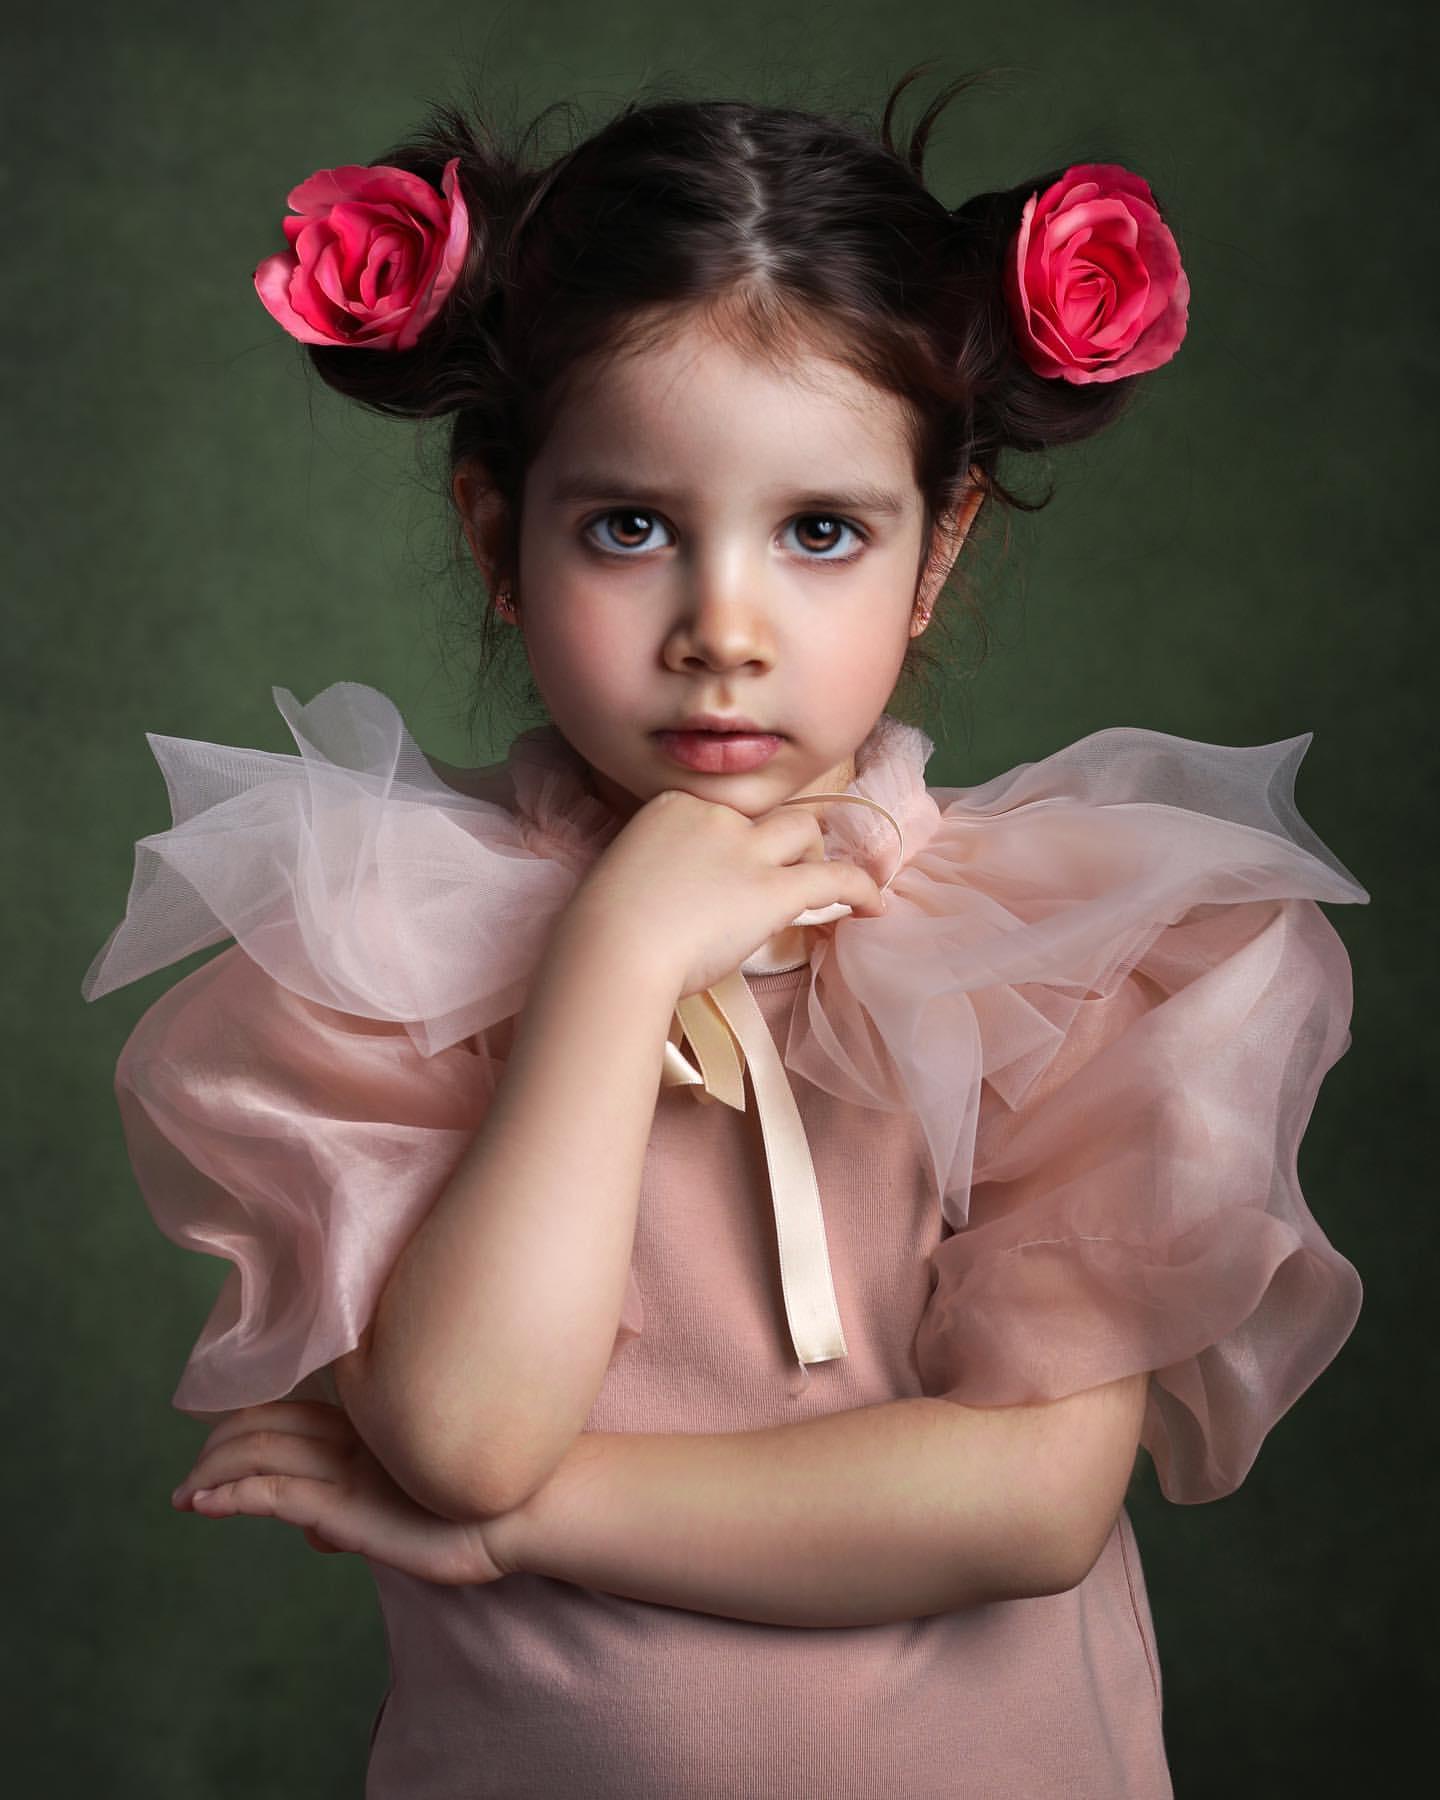 Profesyonel Fine Art Portre Fotoğraf Çekimi